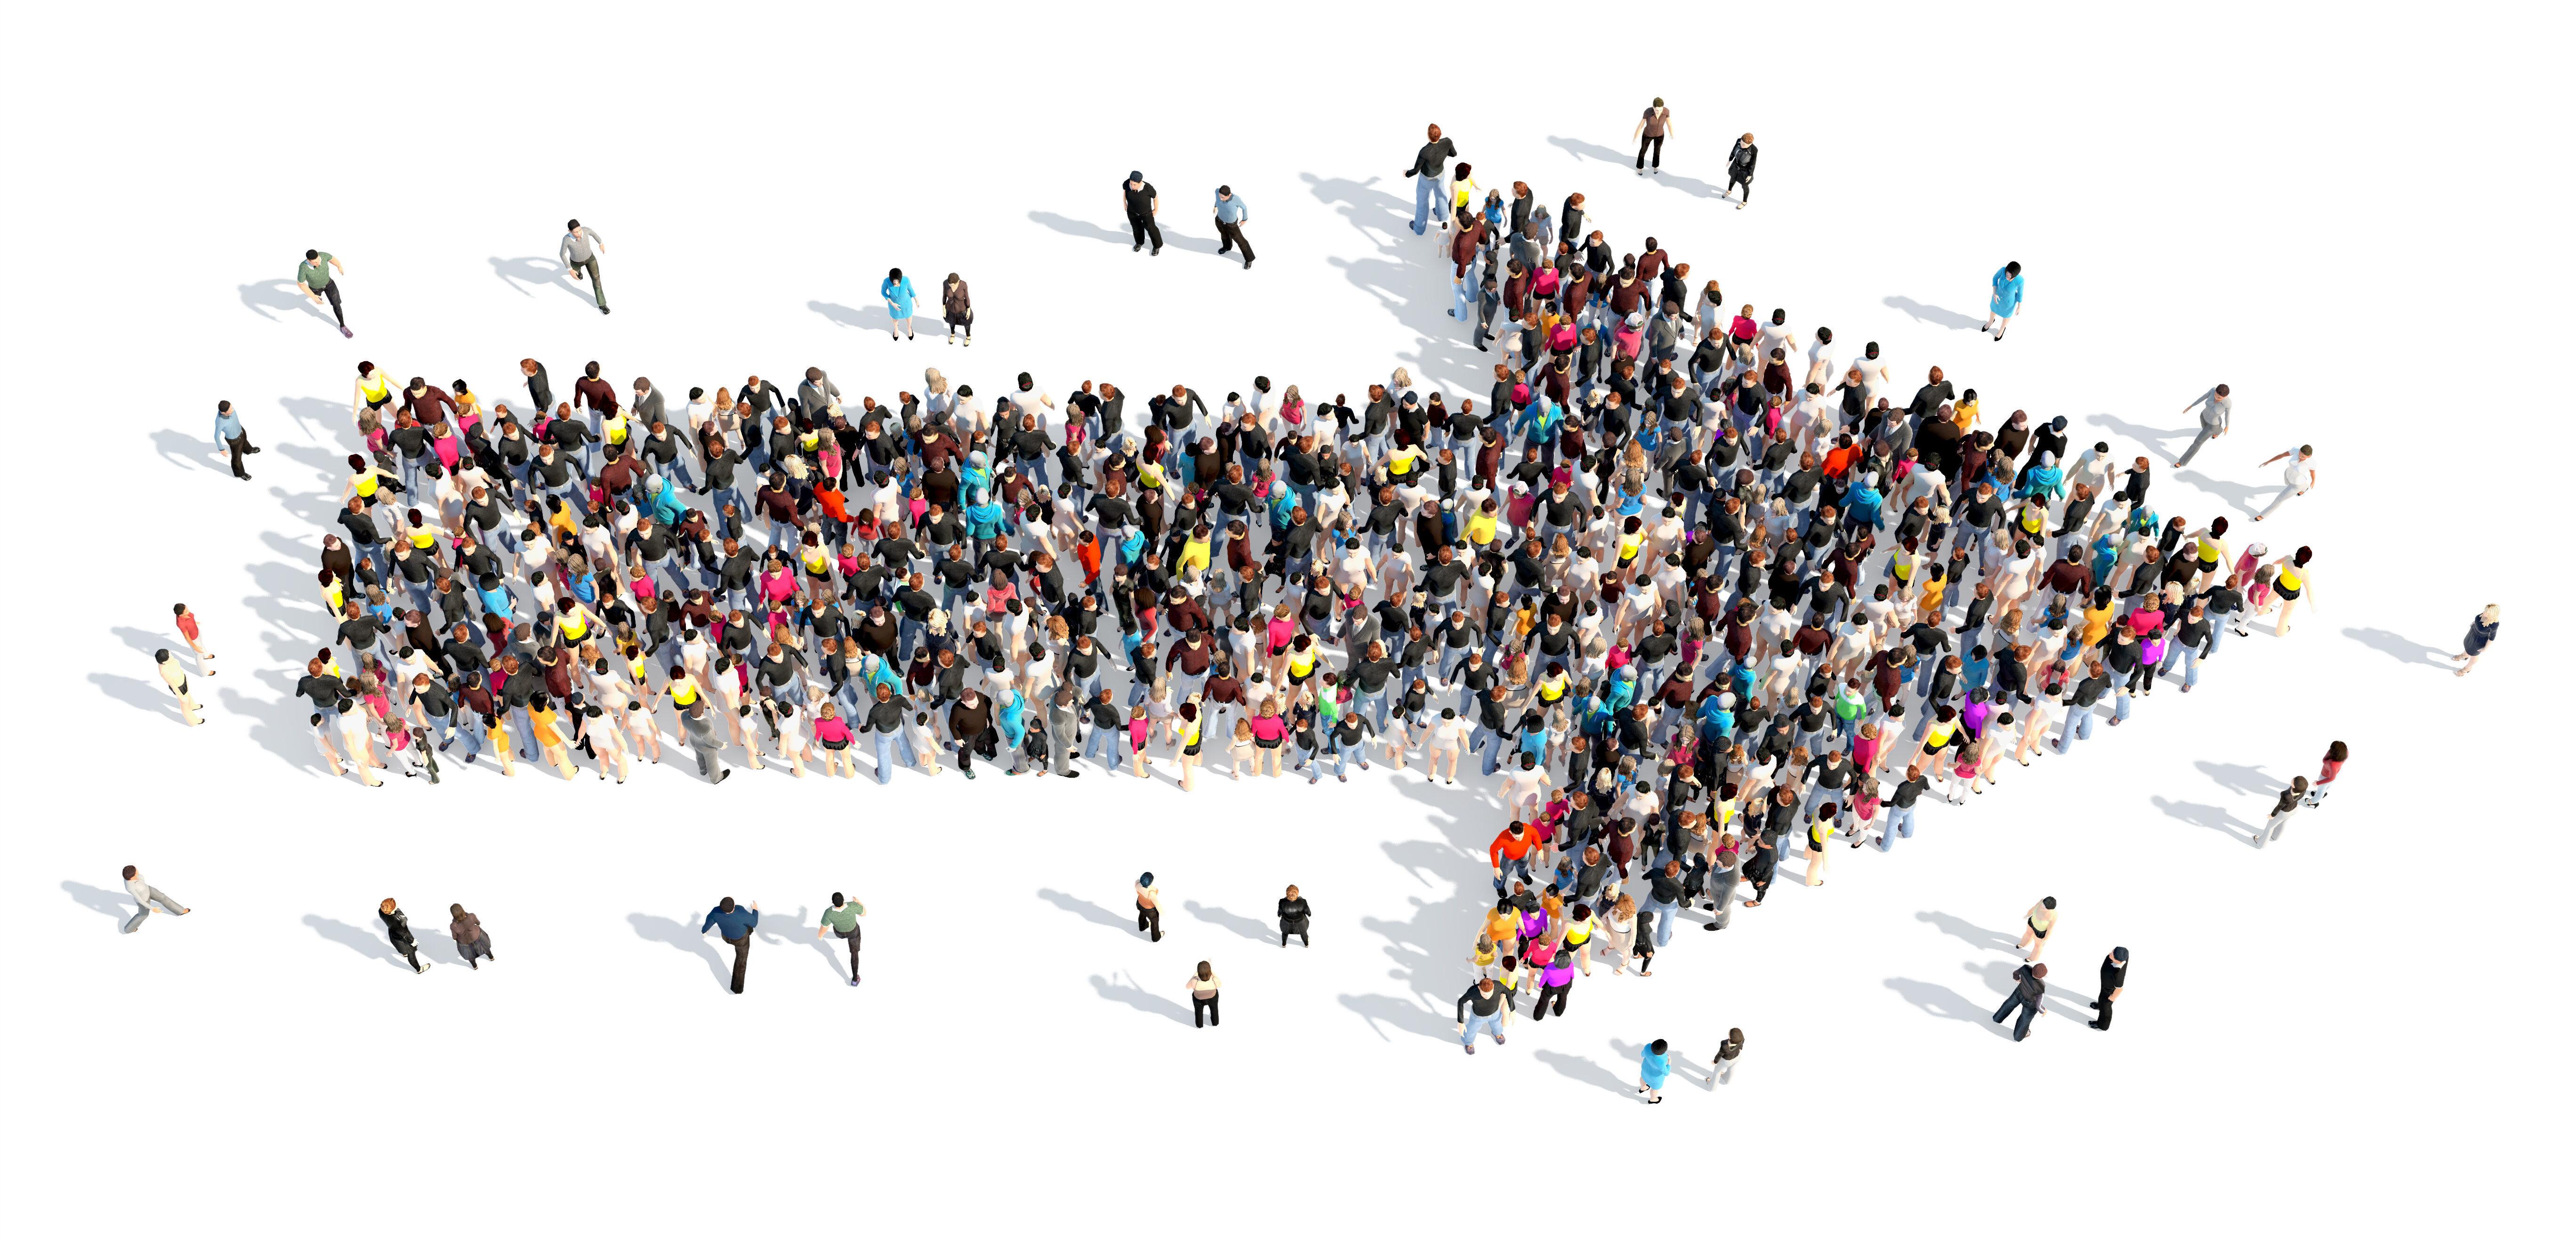 Engagerade samarbetare bygger business, även på distans